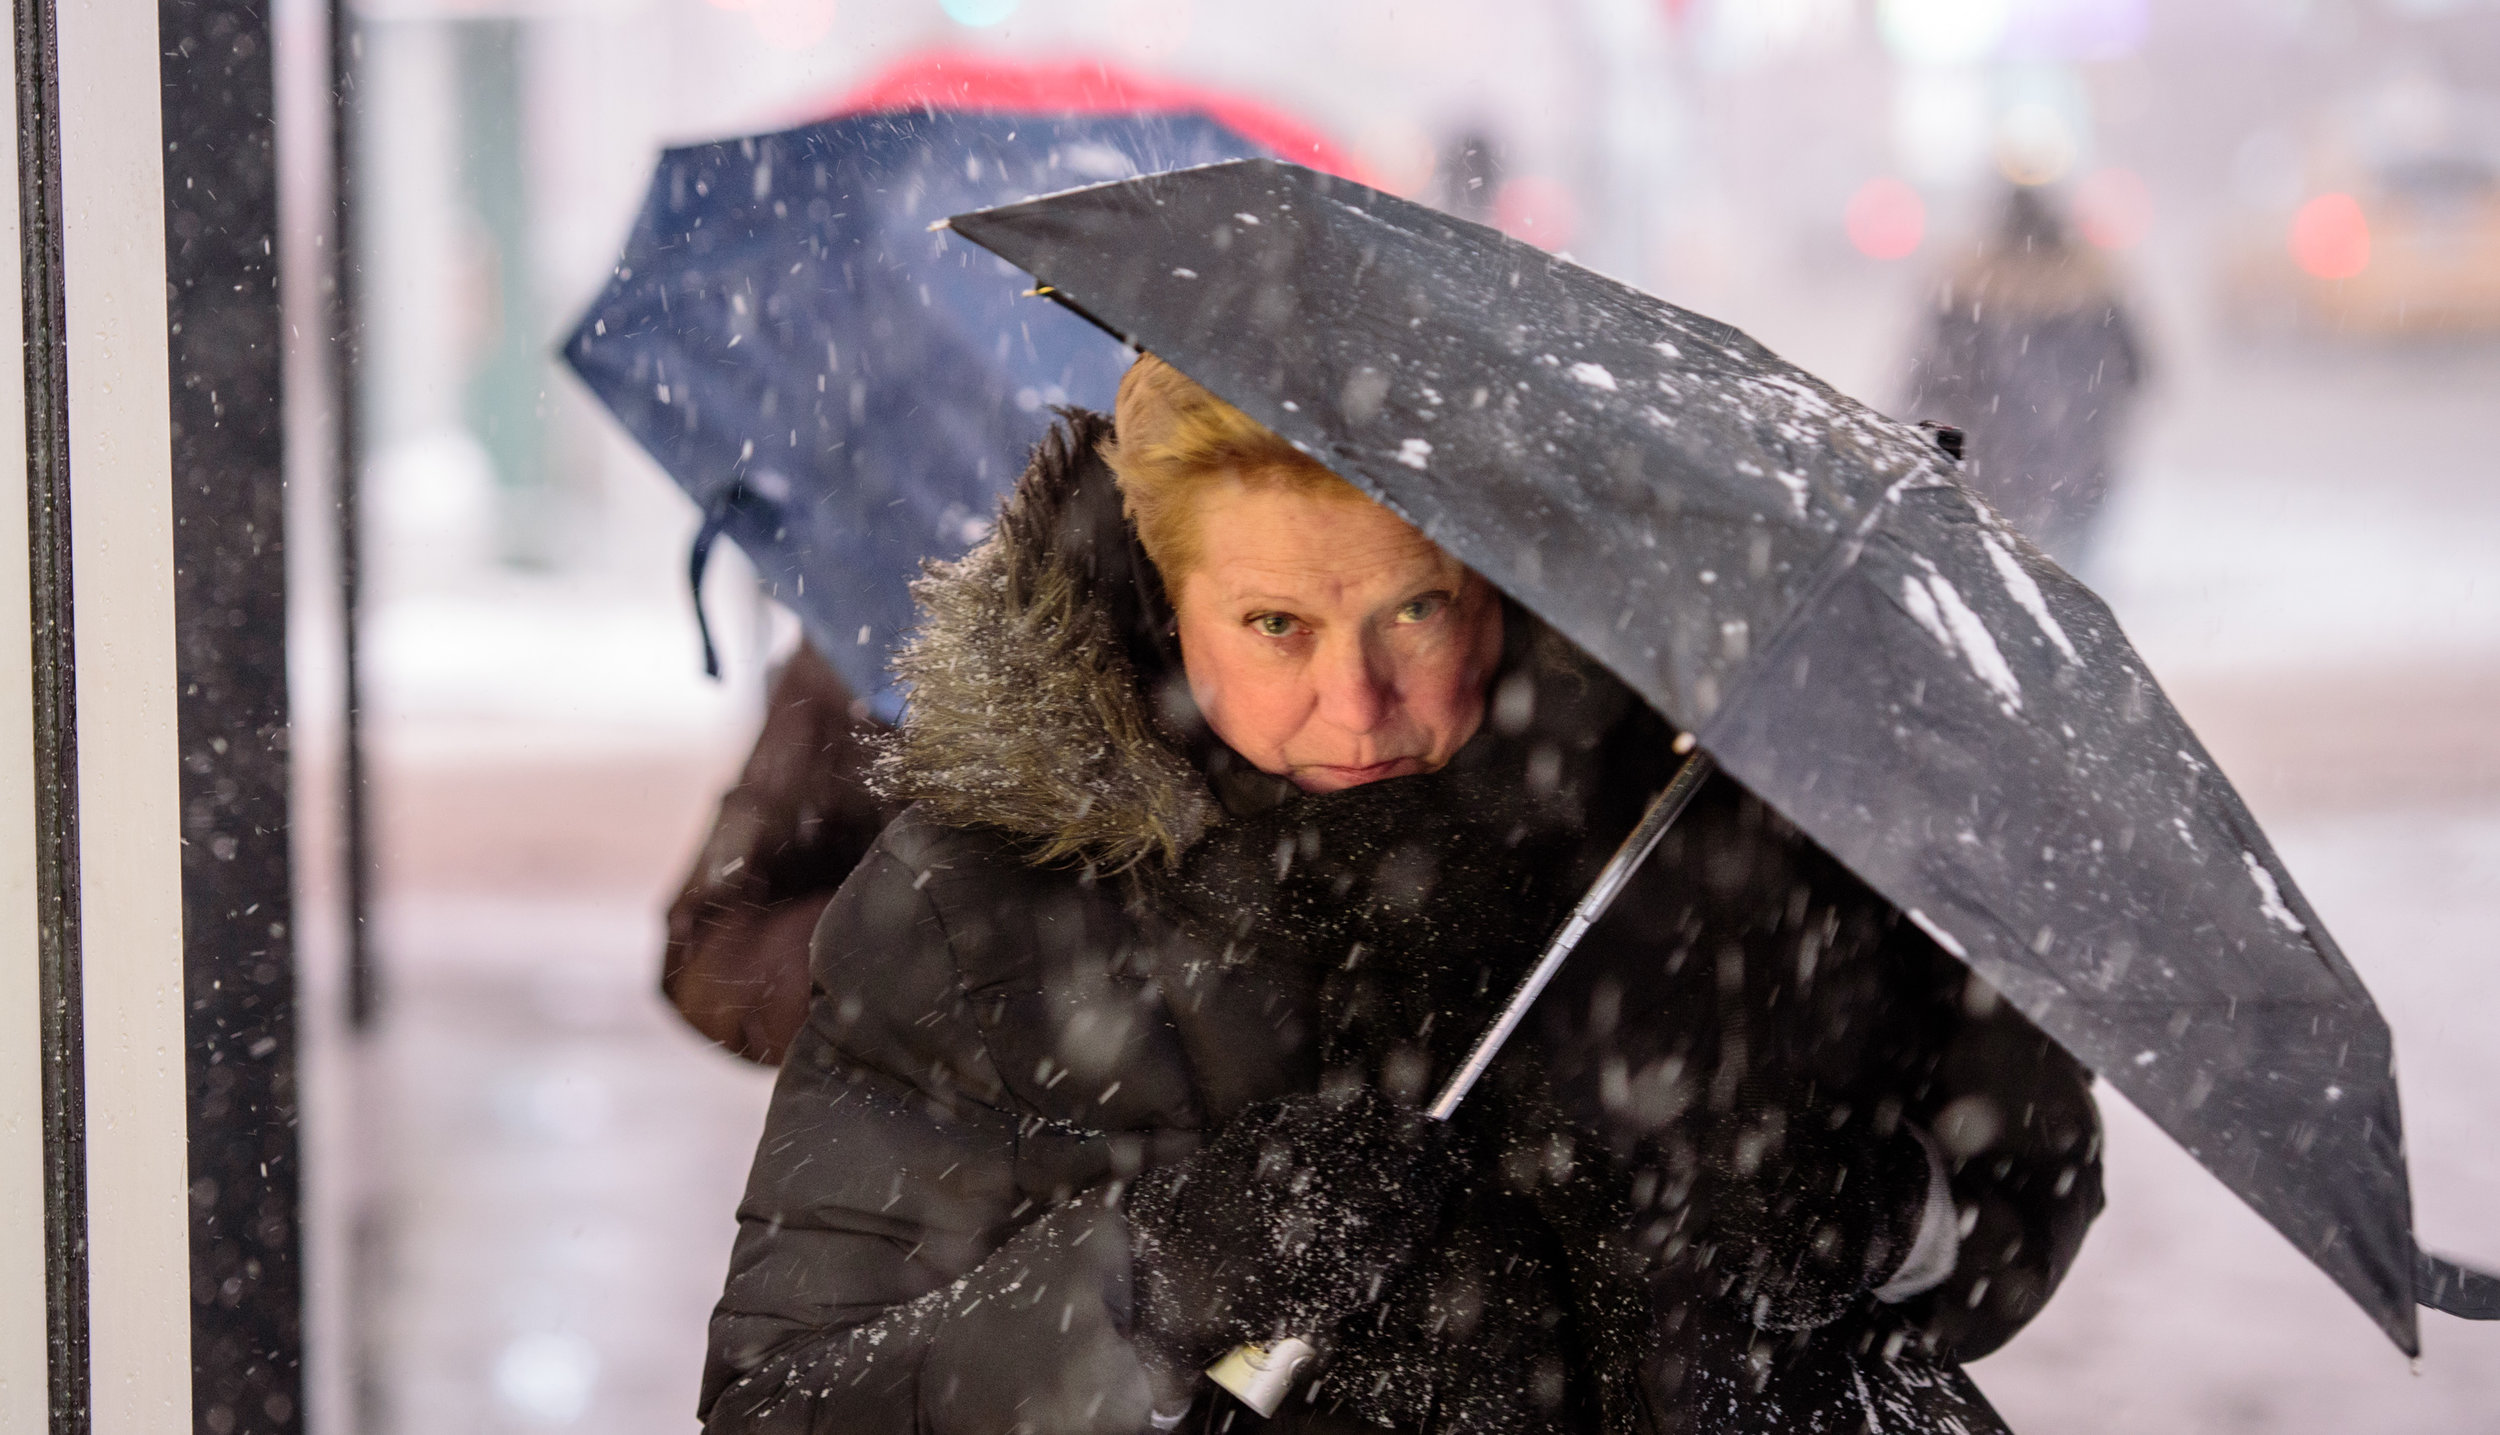 Winter storm blasts New York City